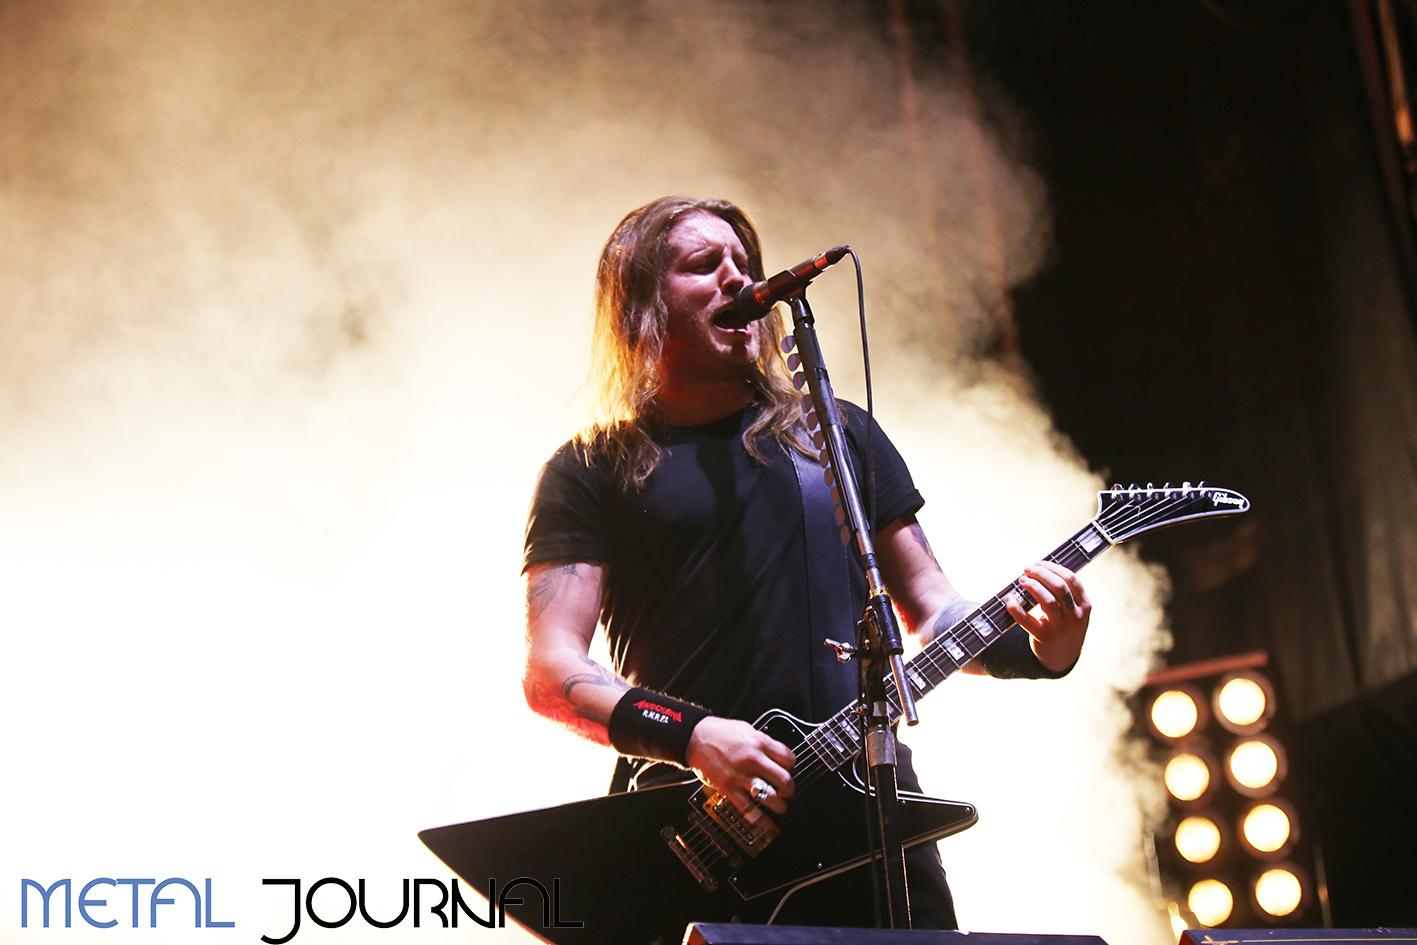 airbourne - leyendas del rock 2019 metal journal pic 13